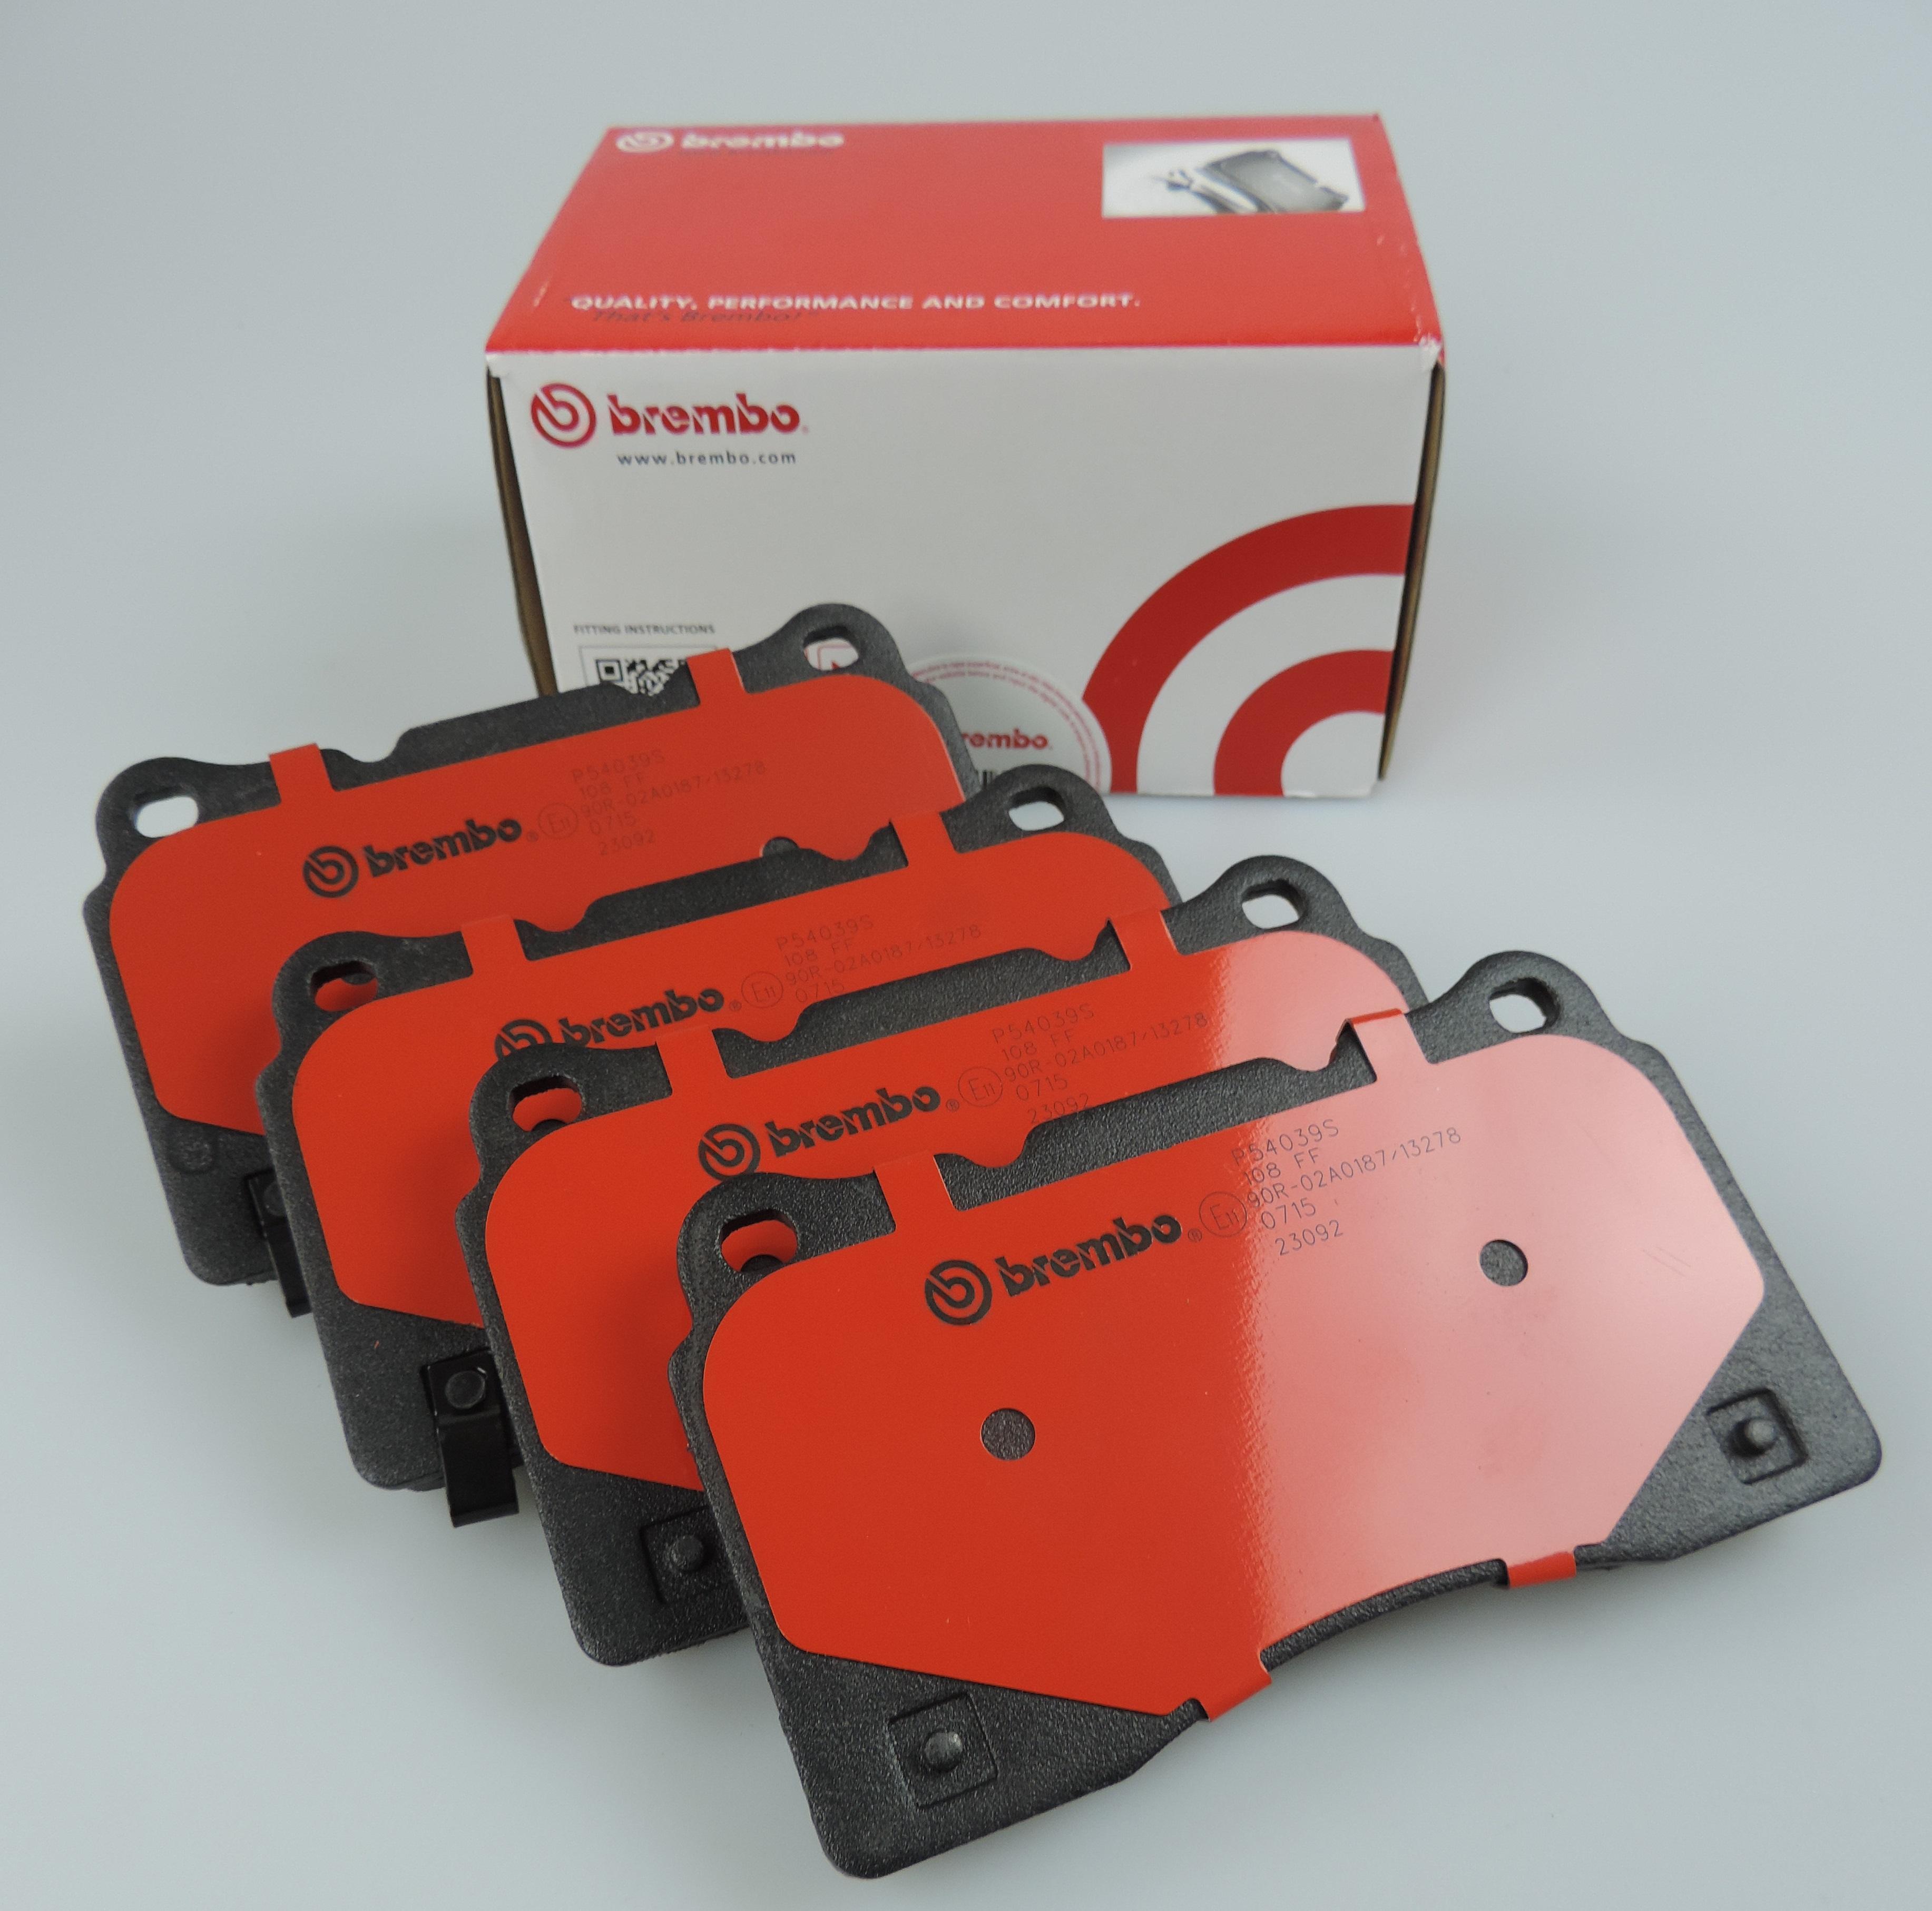 genuine BREMBO brake pads REAR for BMW X5 E53 X3 E83 DB1397